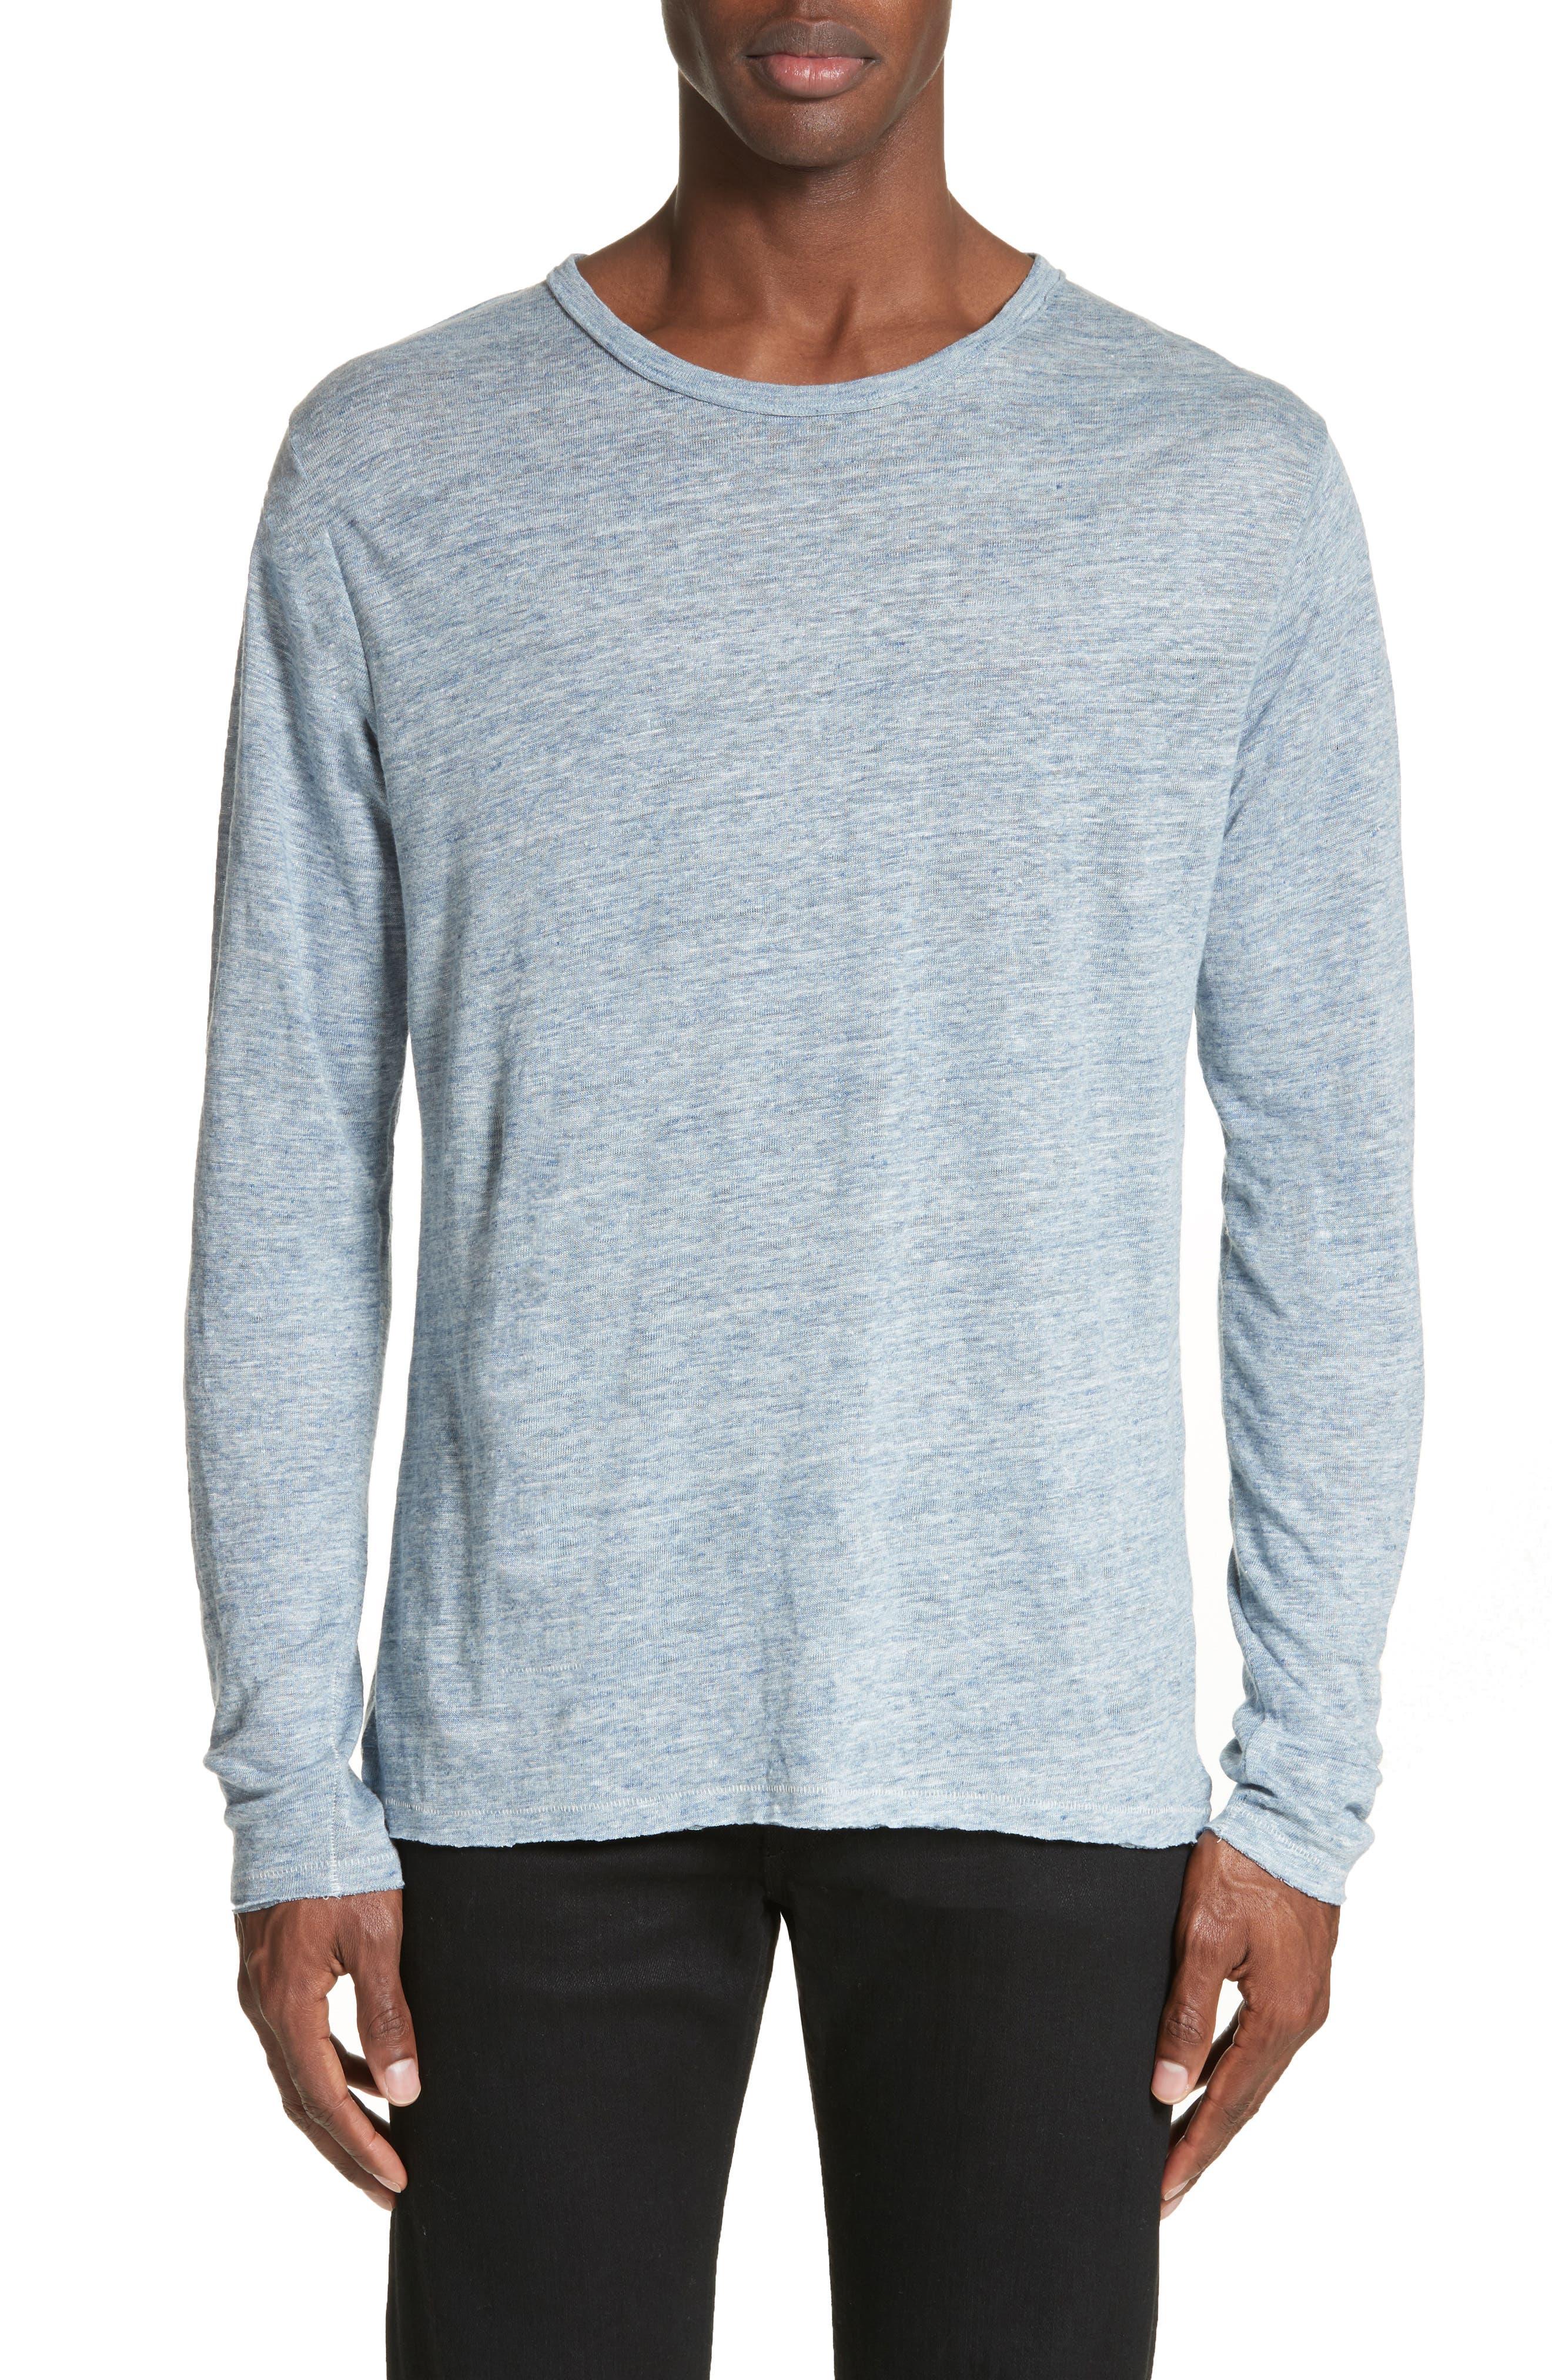 Owen Linen Long Sleeve T-Shirt,                             Main thumbnail 1, color,                             Blue